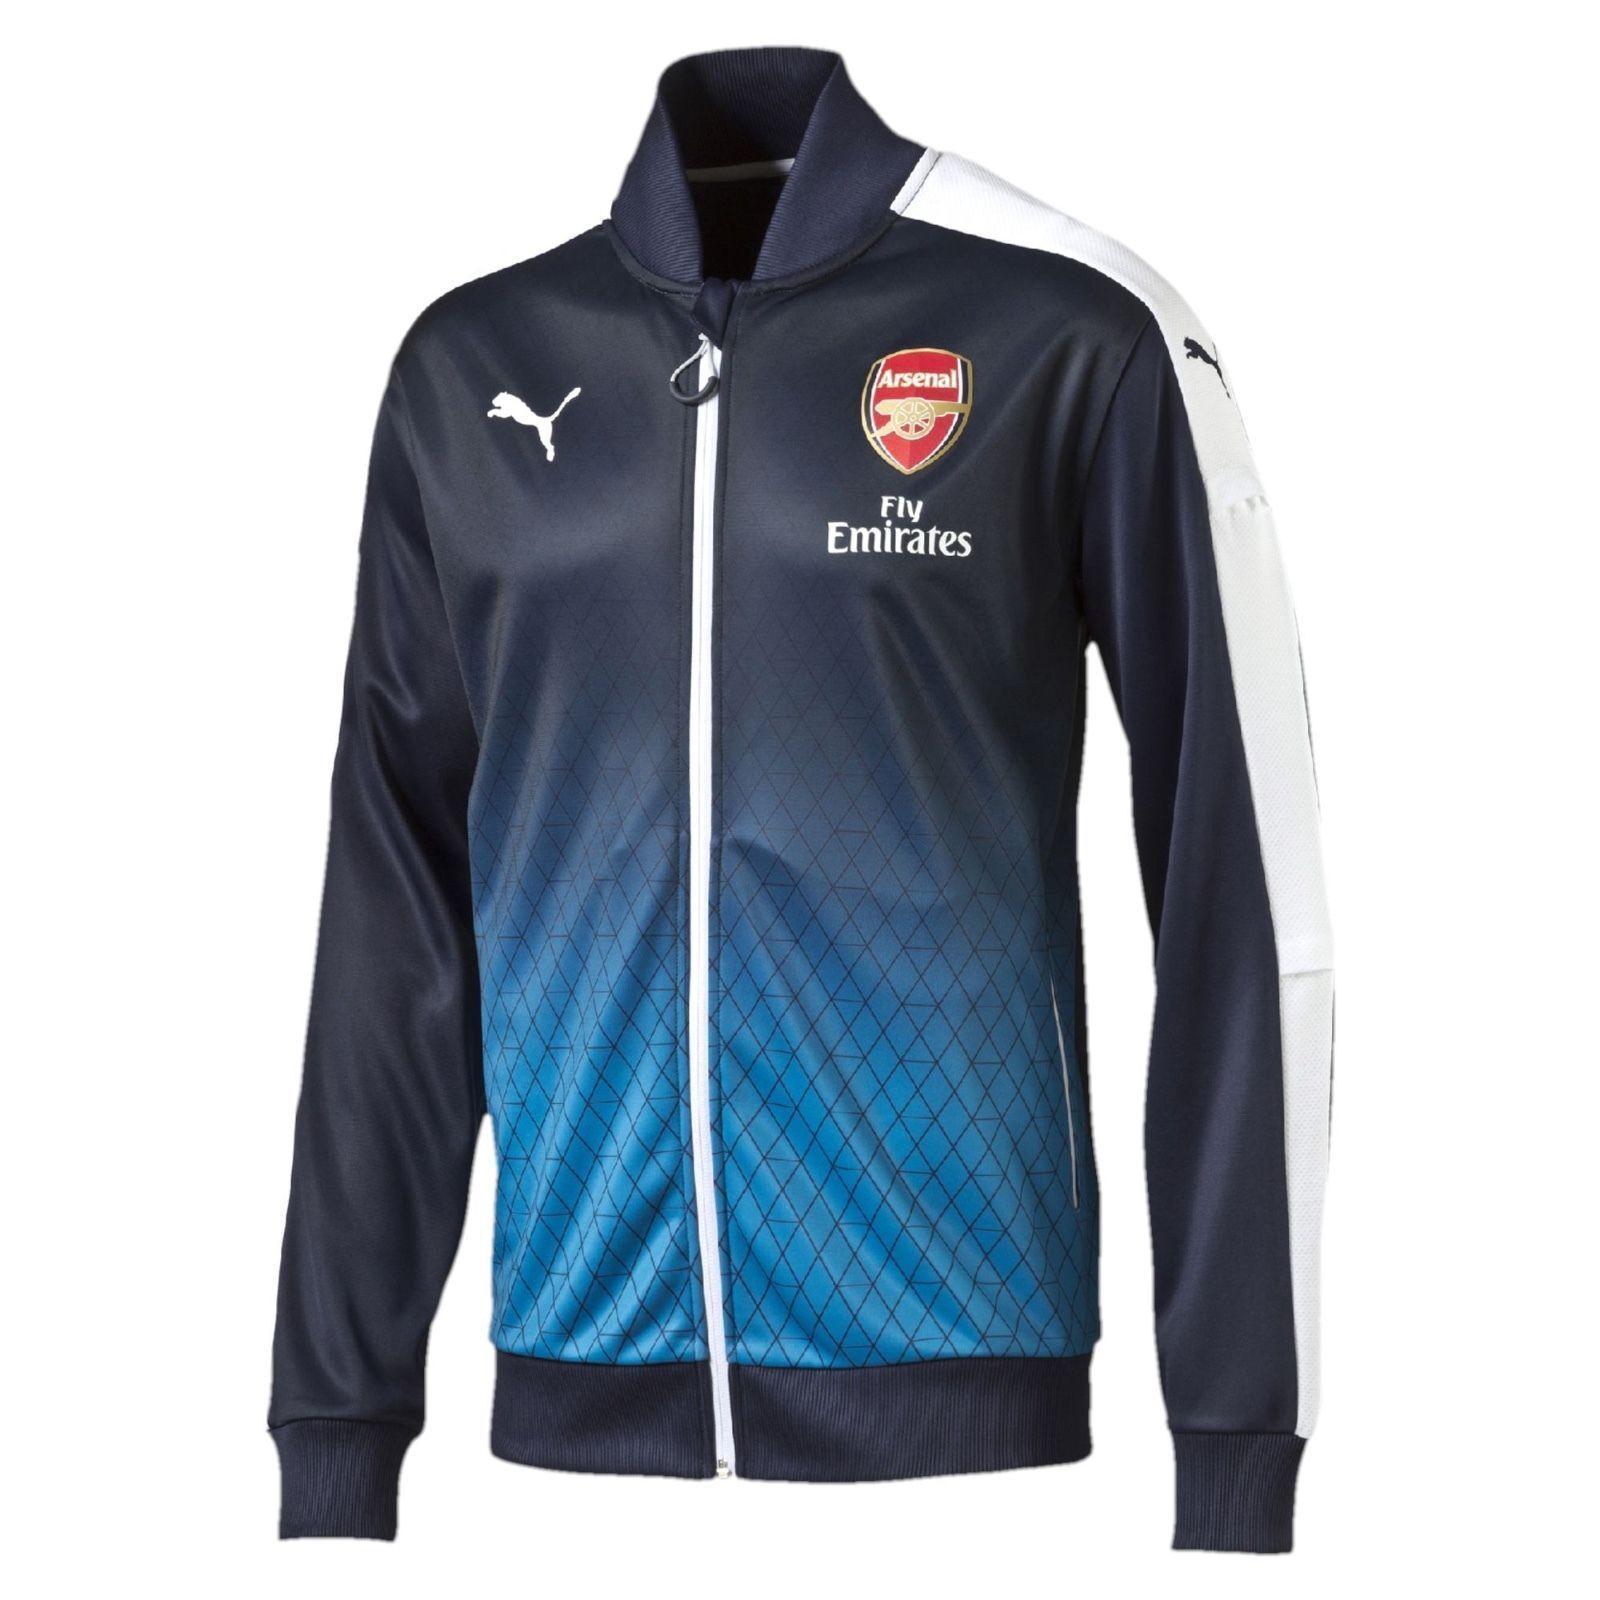 2015-2016 Puma Arsenal Londres Estadio chaqueta para hombre (pequeño)